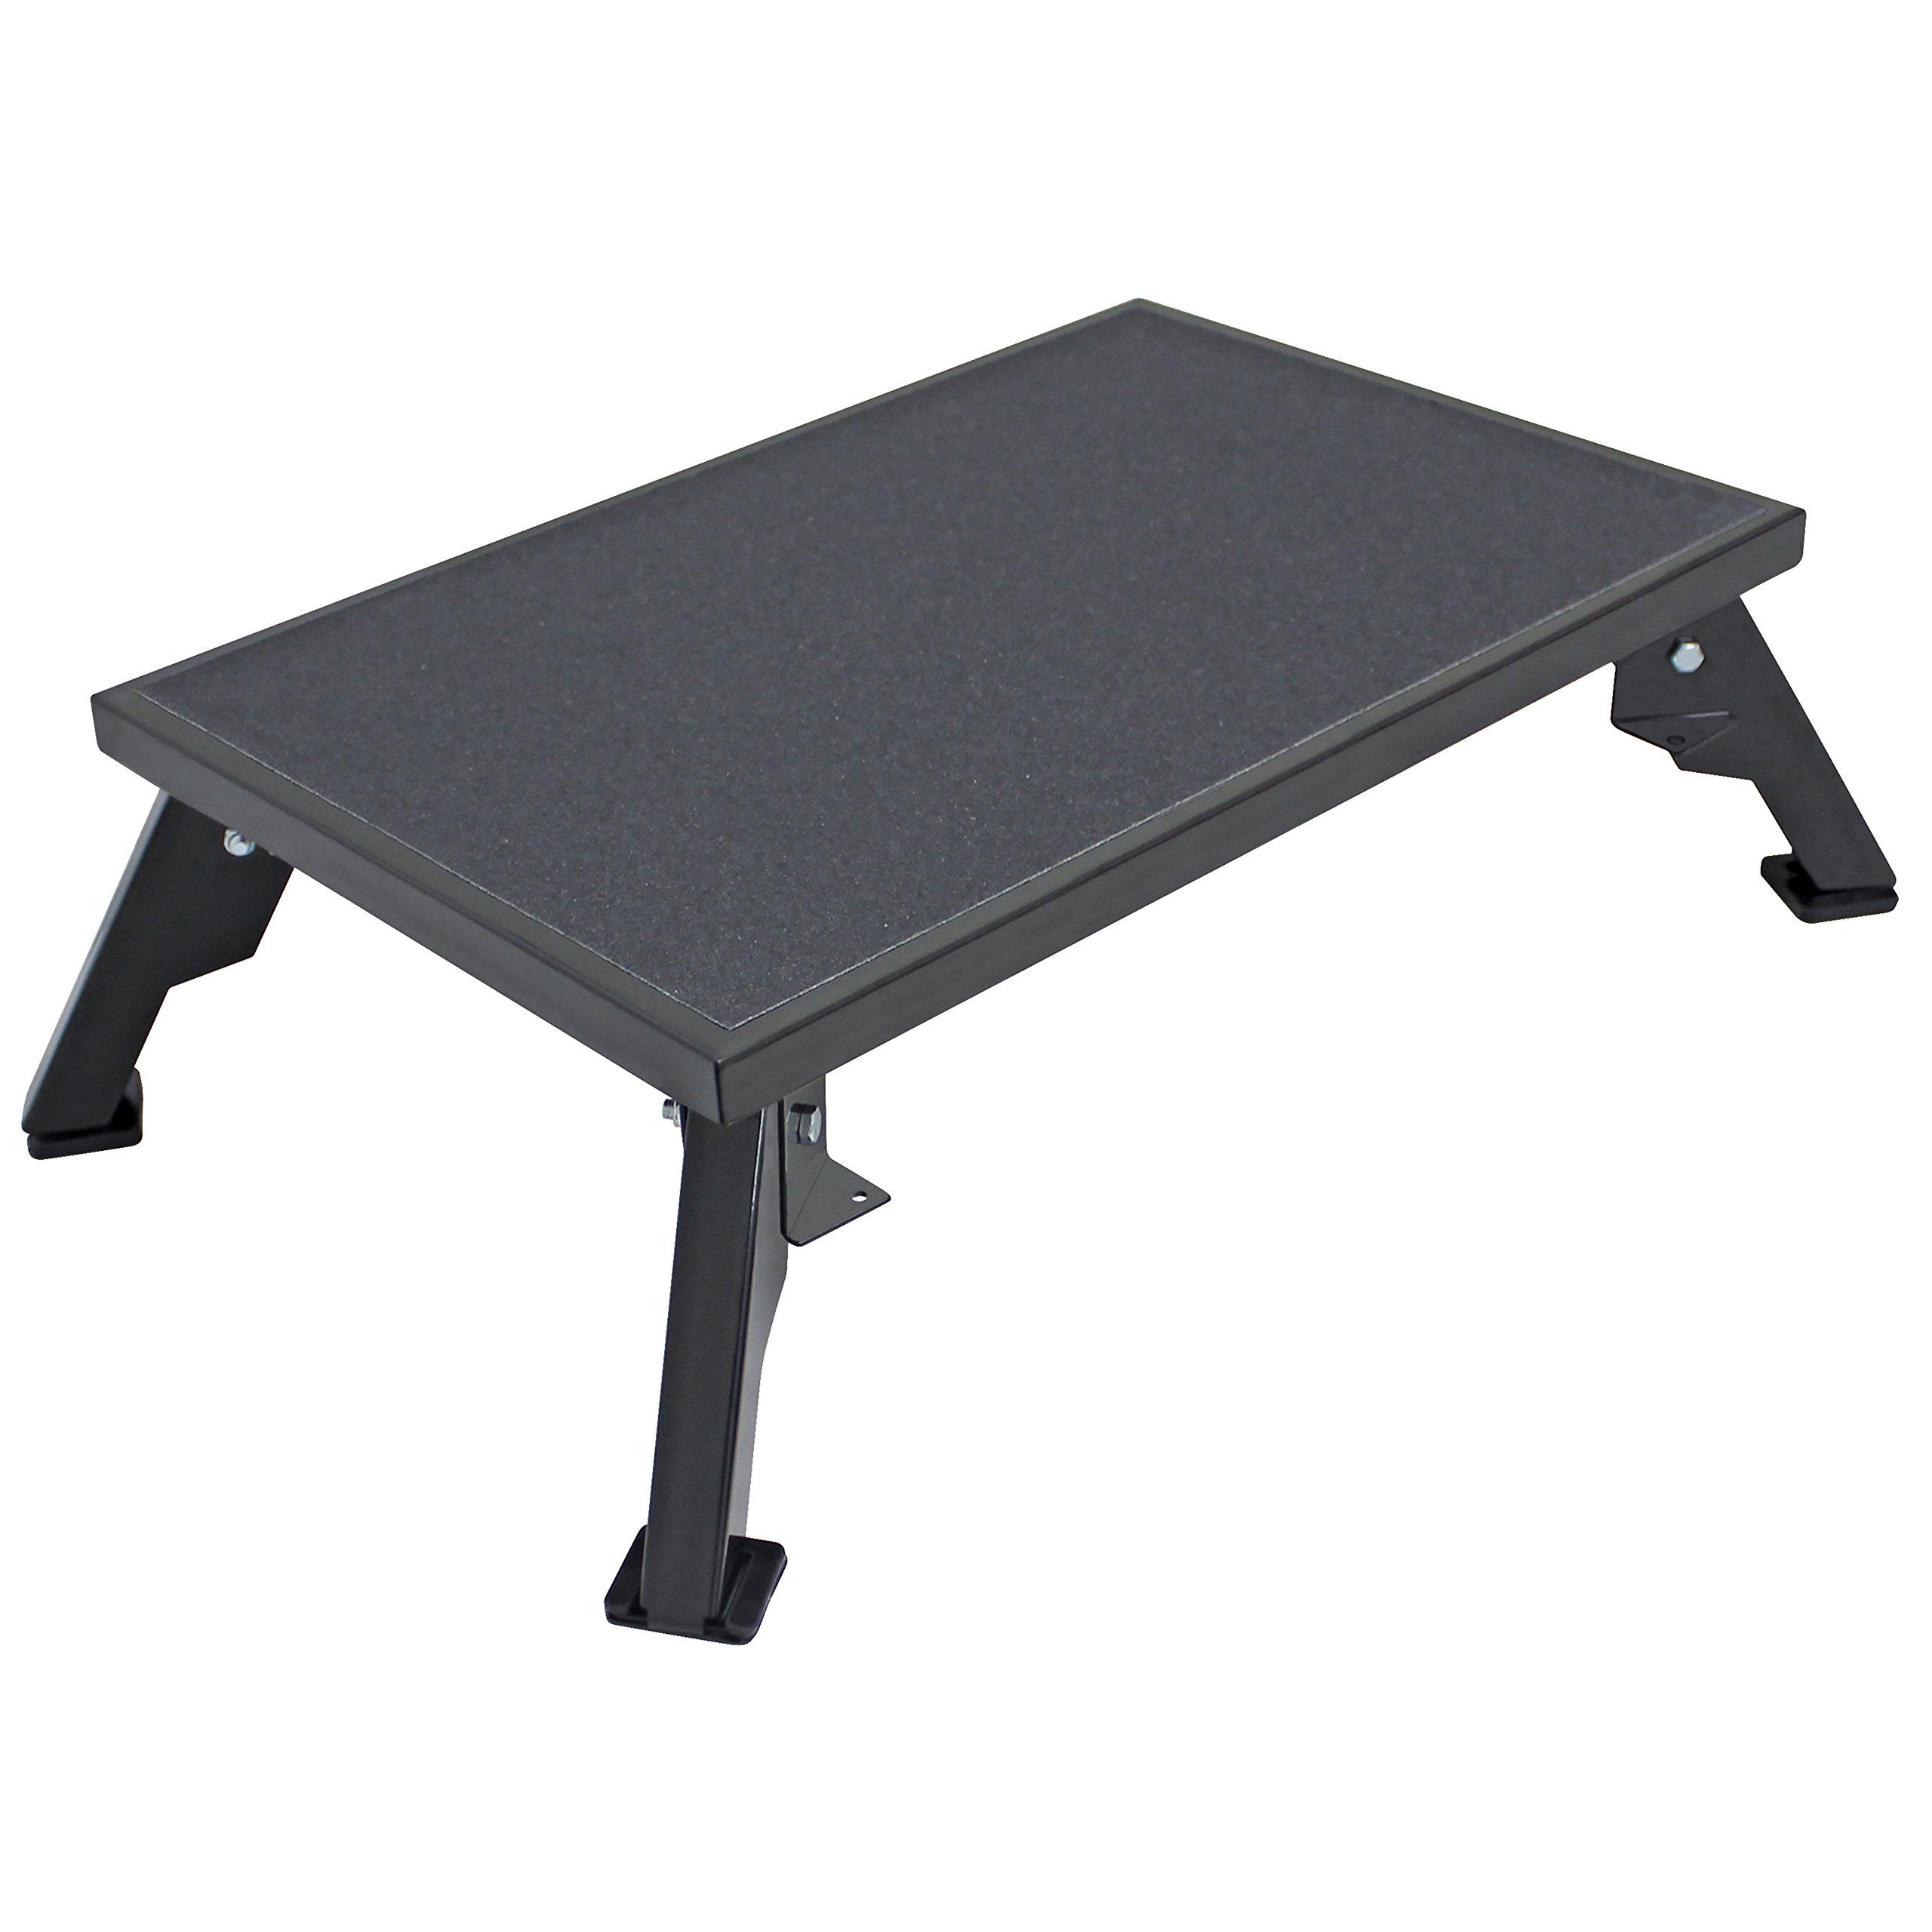 Rv Platform Step Folding Adjustable Extra Large Non Skid